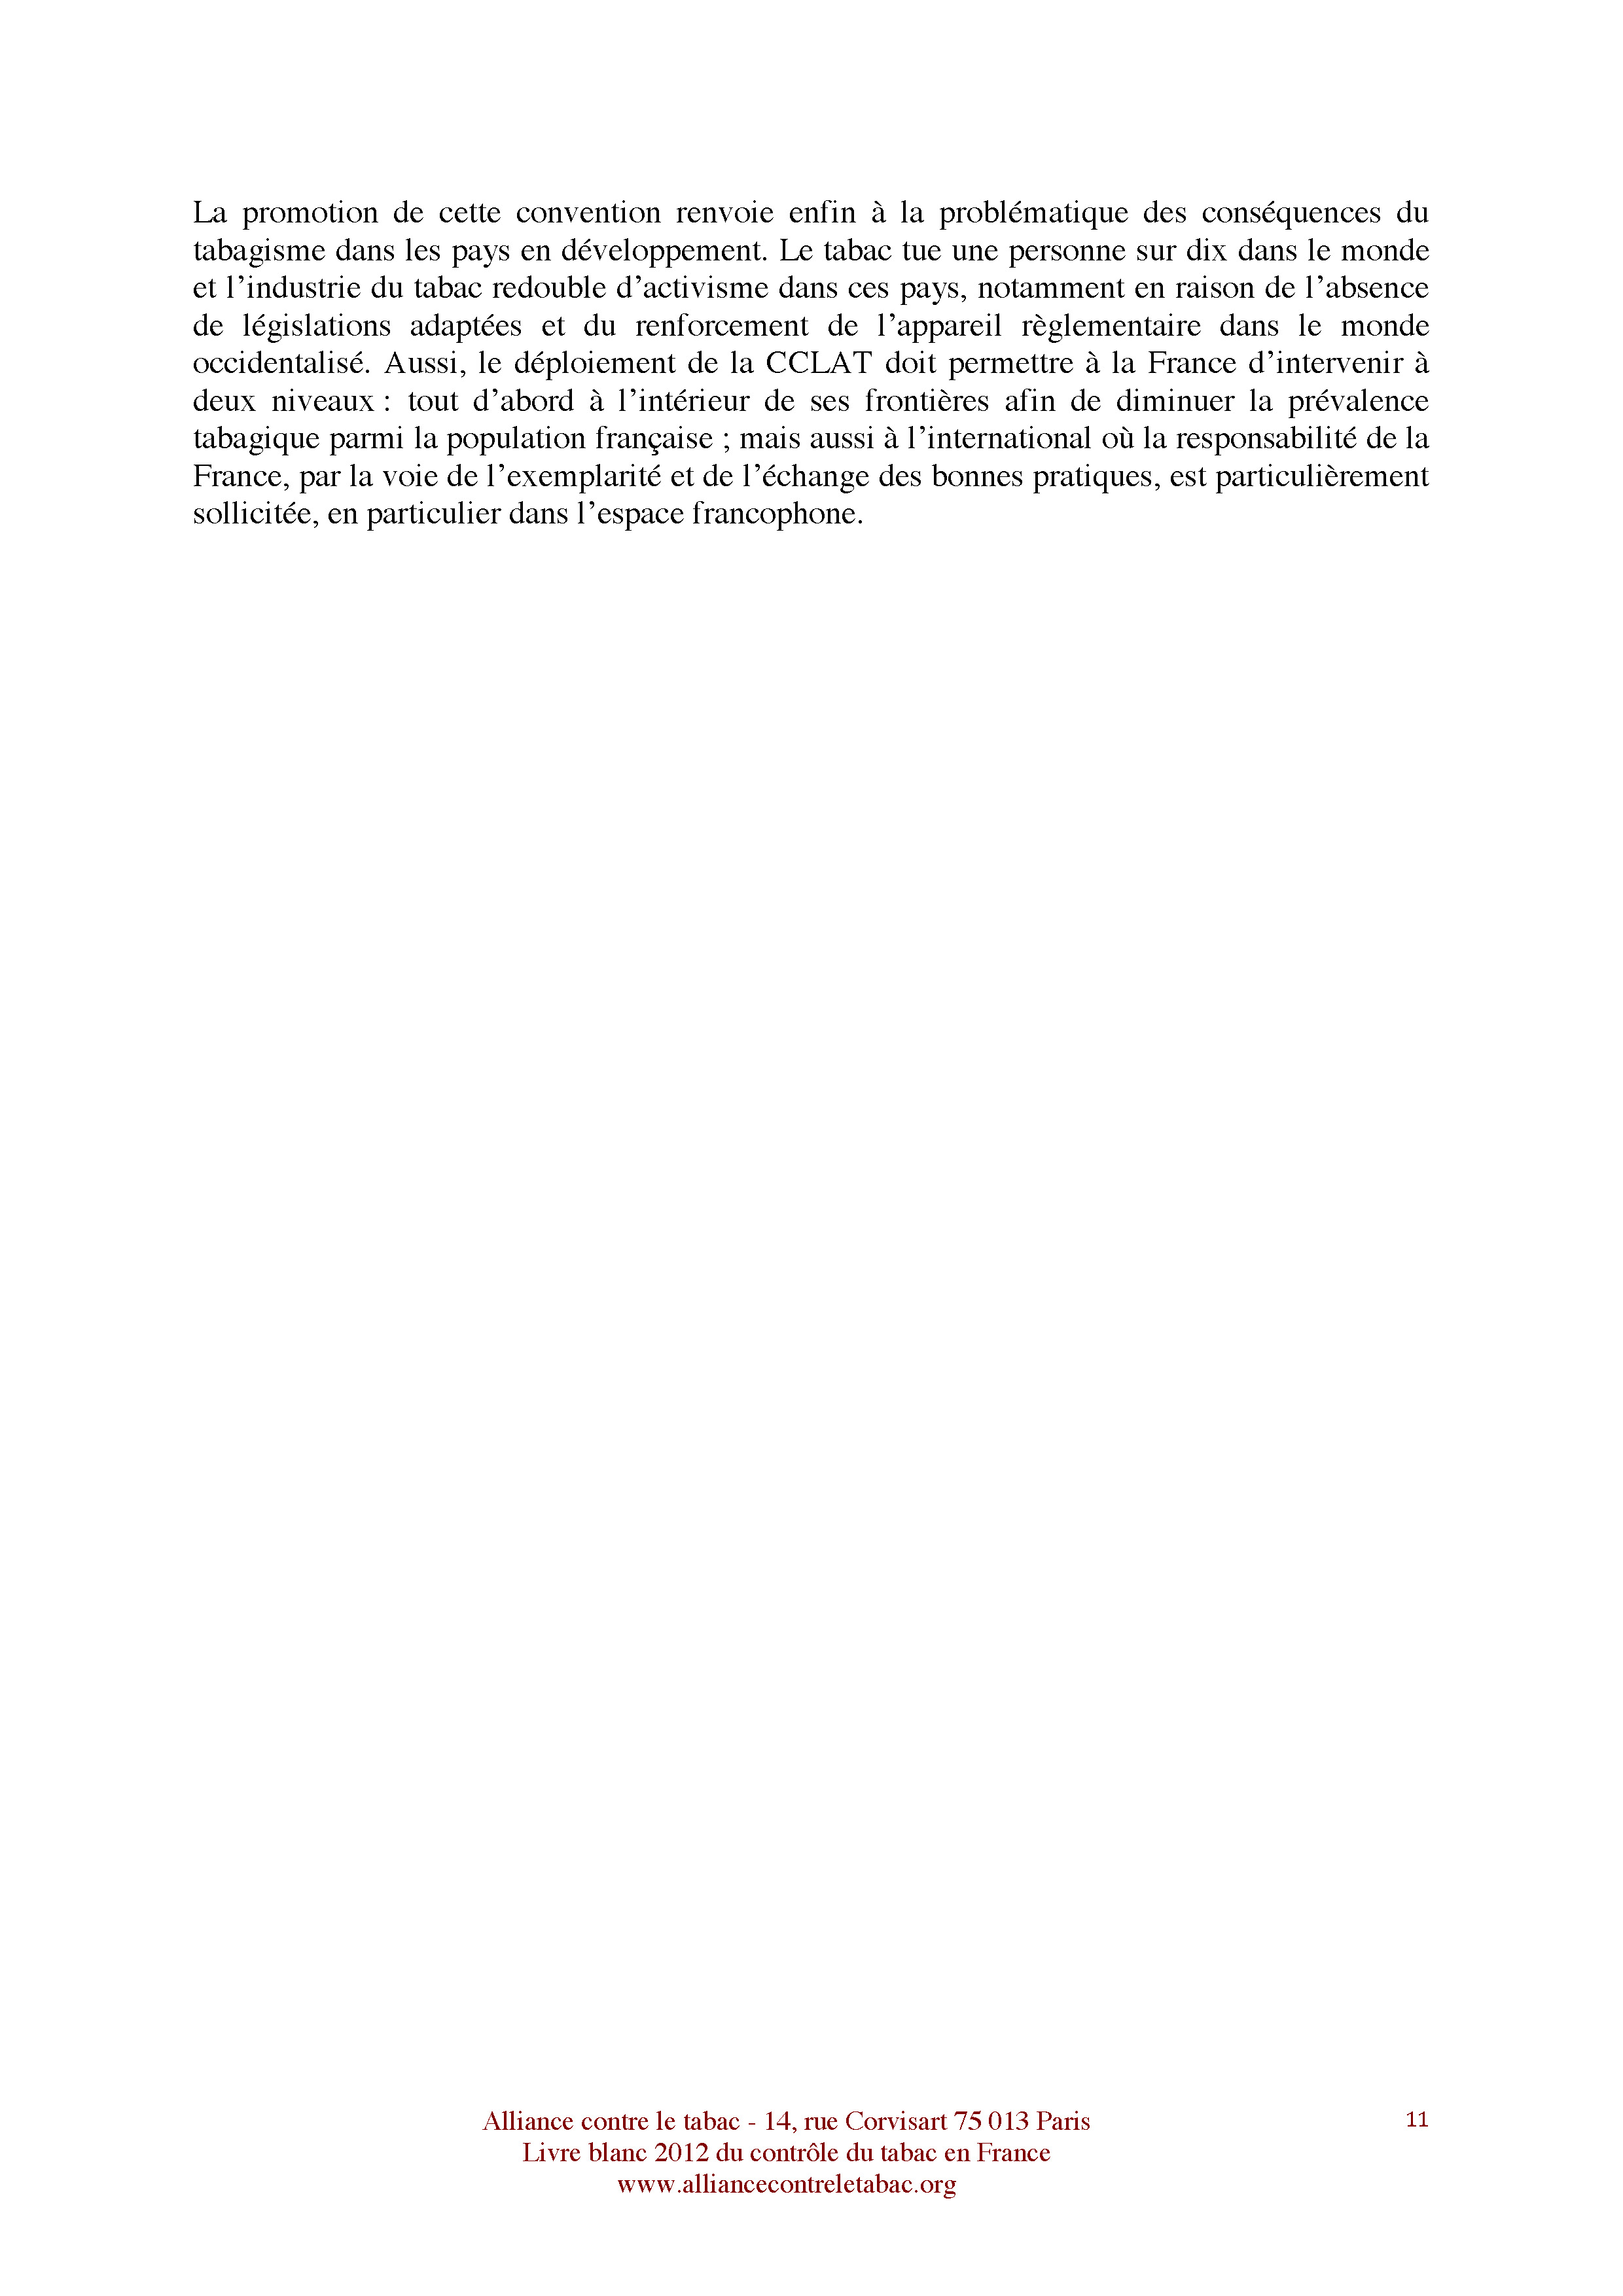 Alliance-dossier-presse_livre-blanc-22mars2012_Page_11.jpg